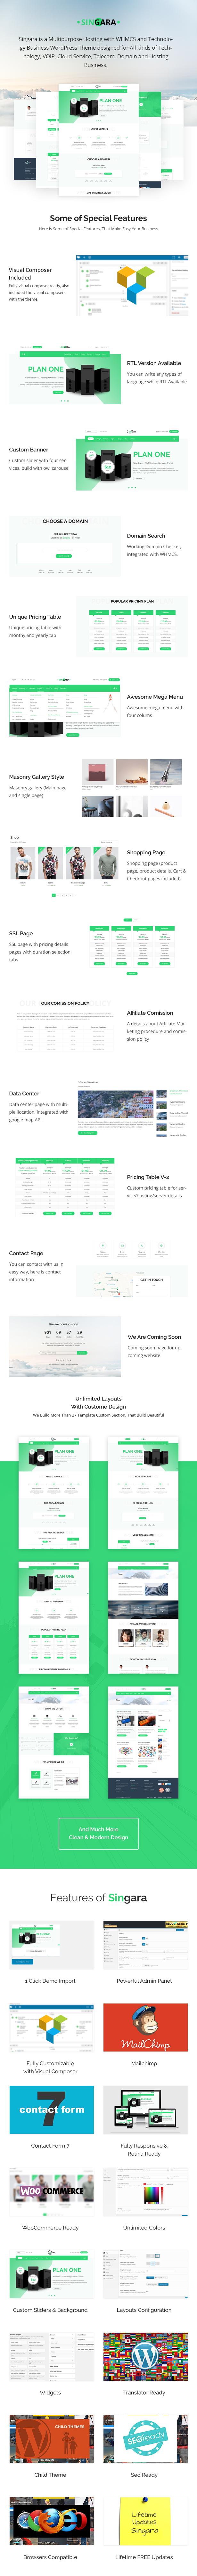 Singara – Multipurpose Hosting with WHMCS WordPress Themes, Gobase64